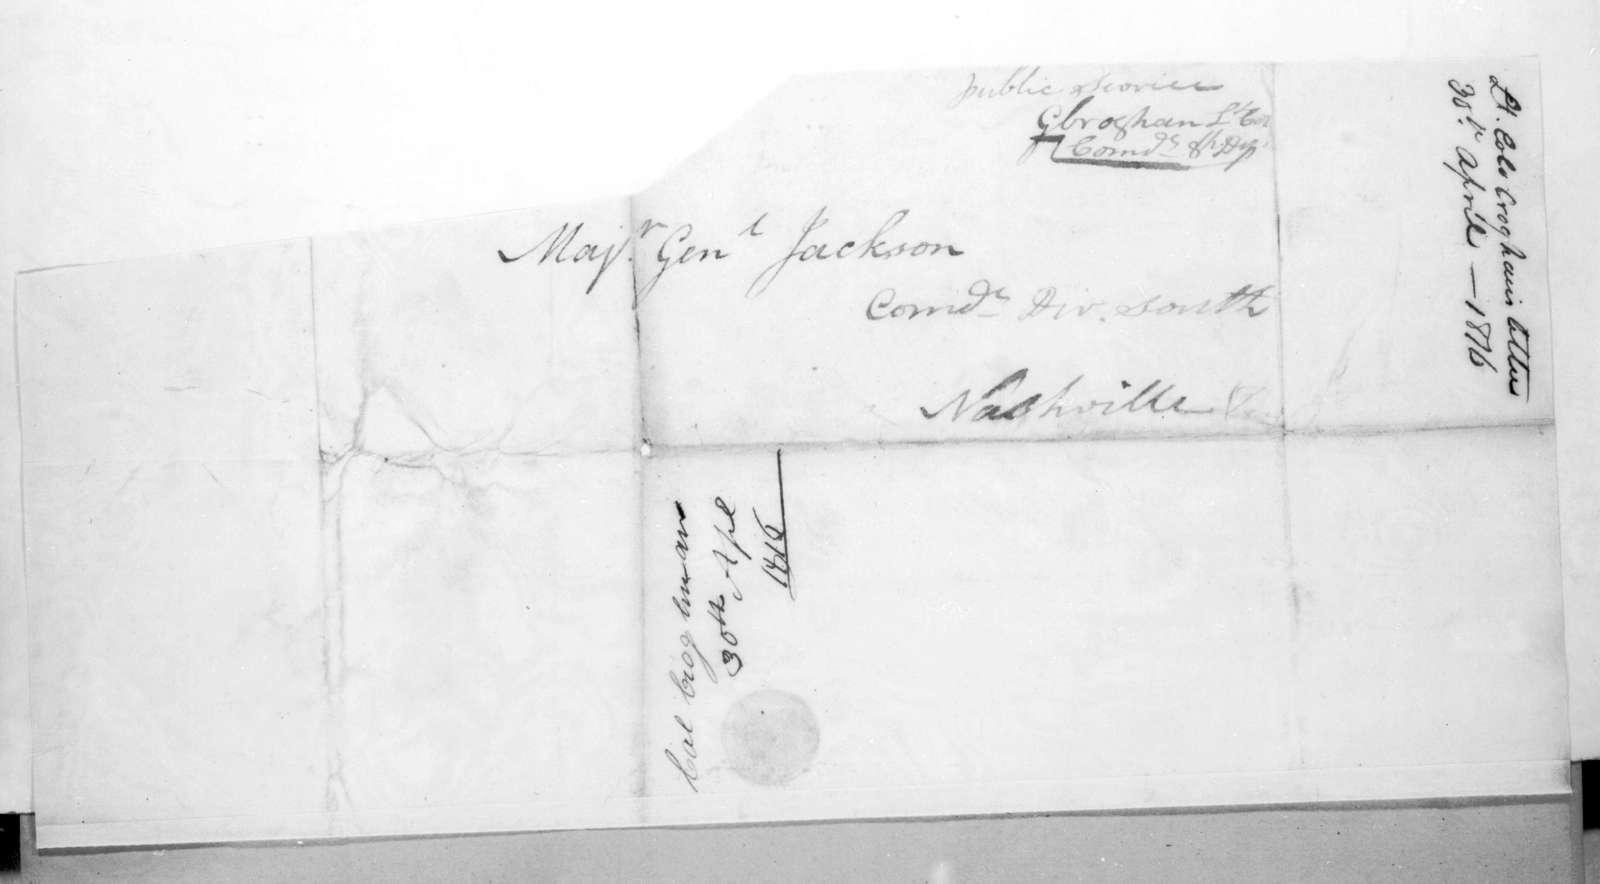 George Croghan to Andrew Jackson, April 30, 1816